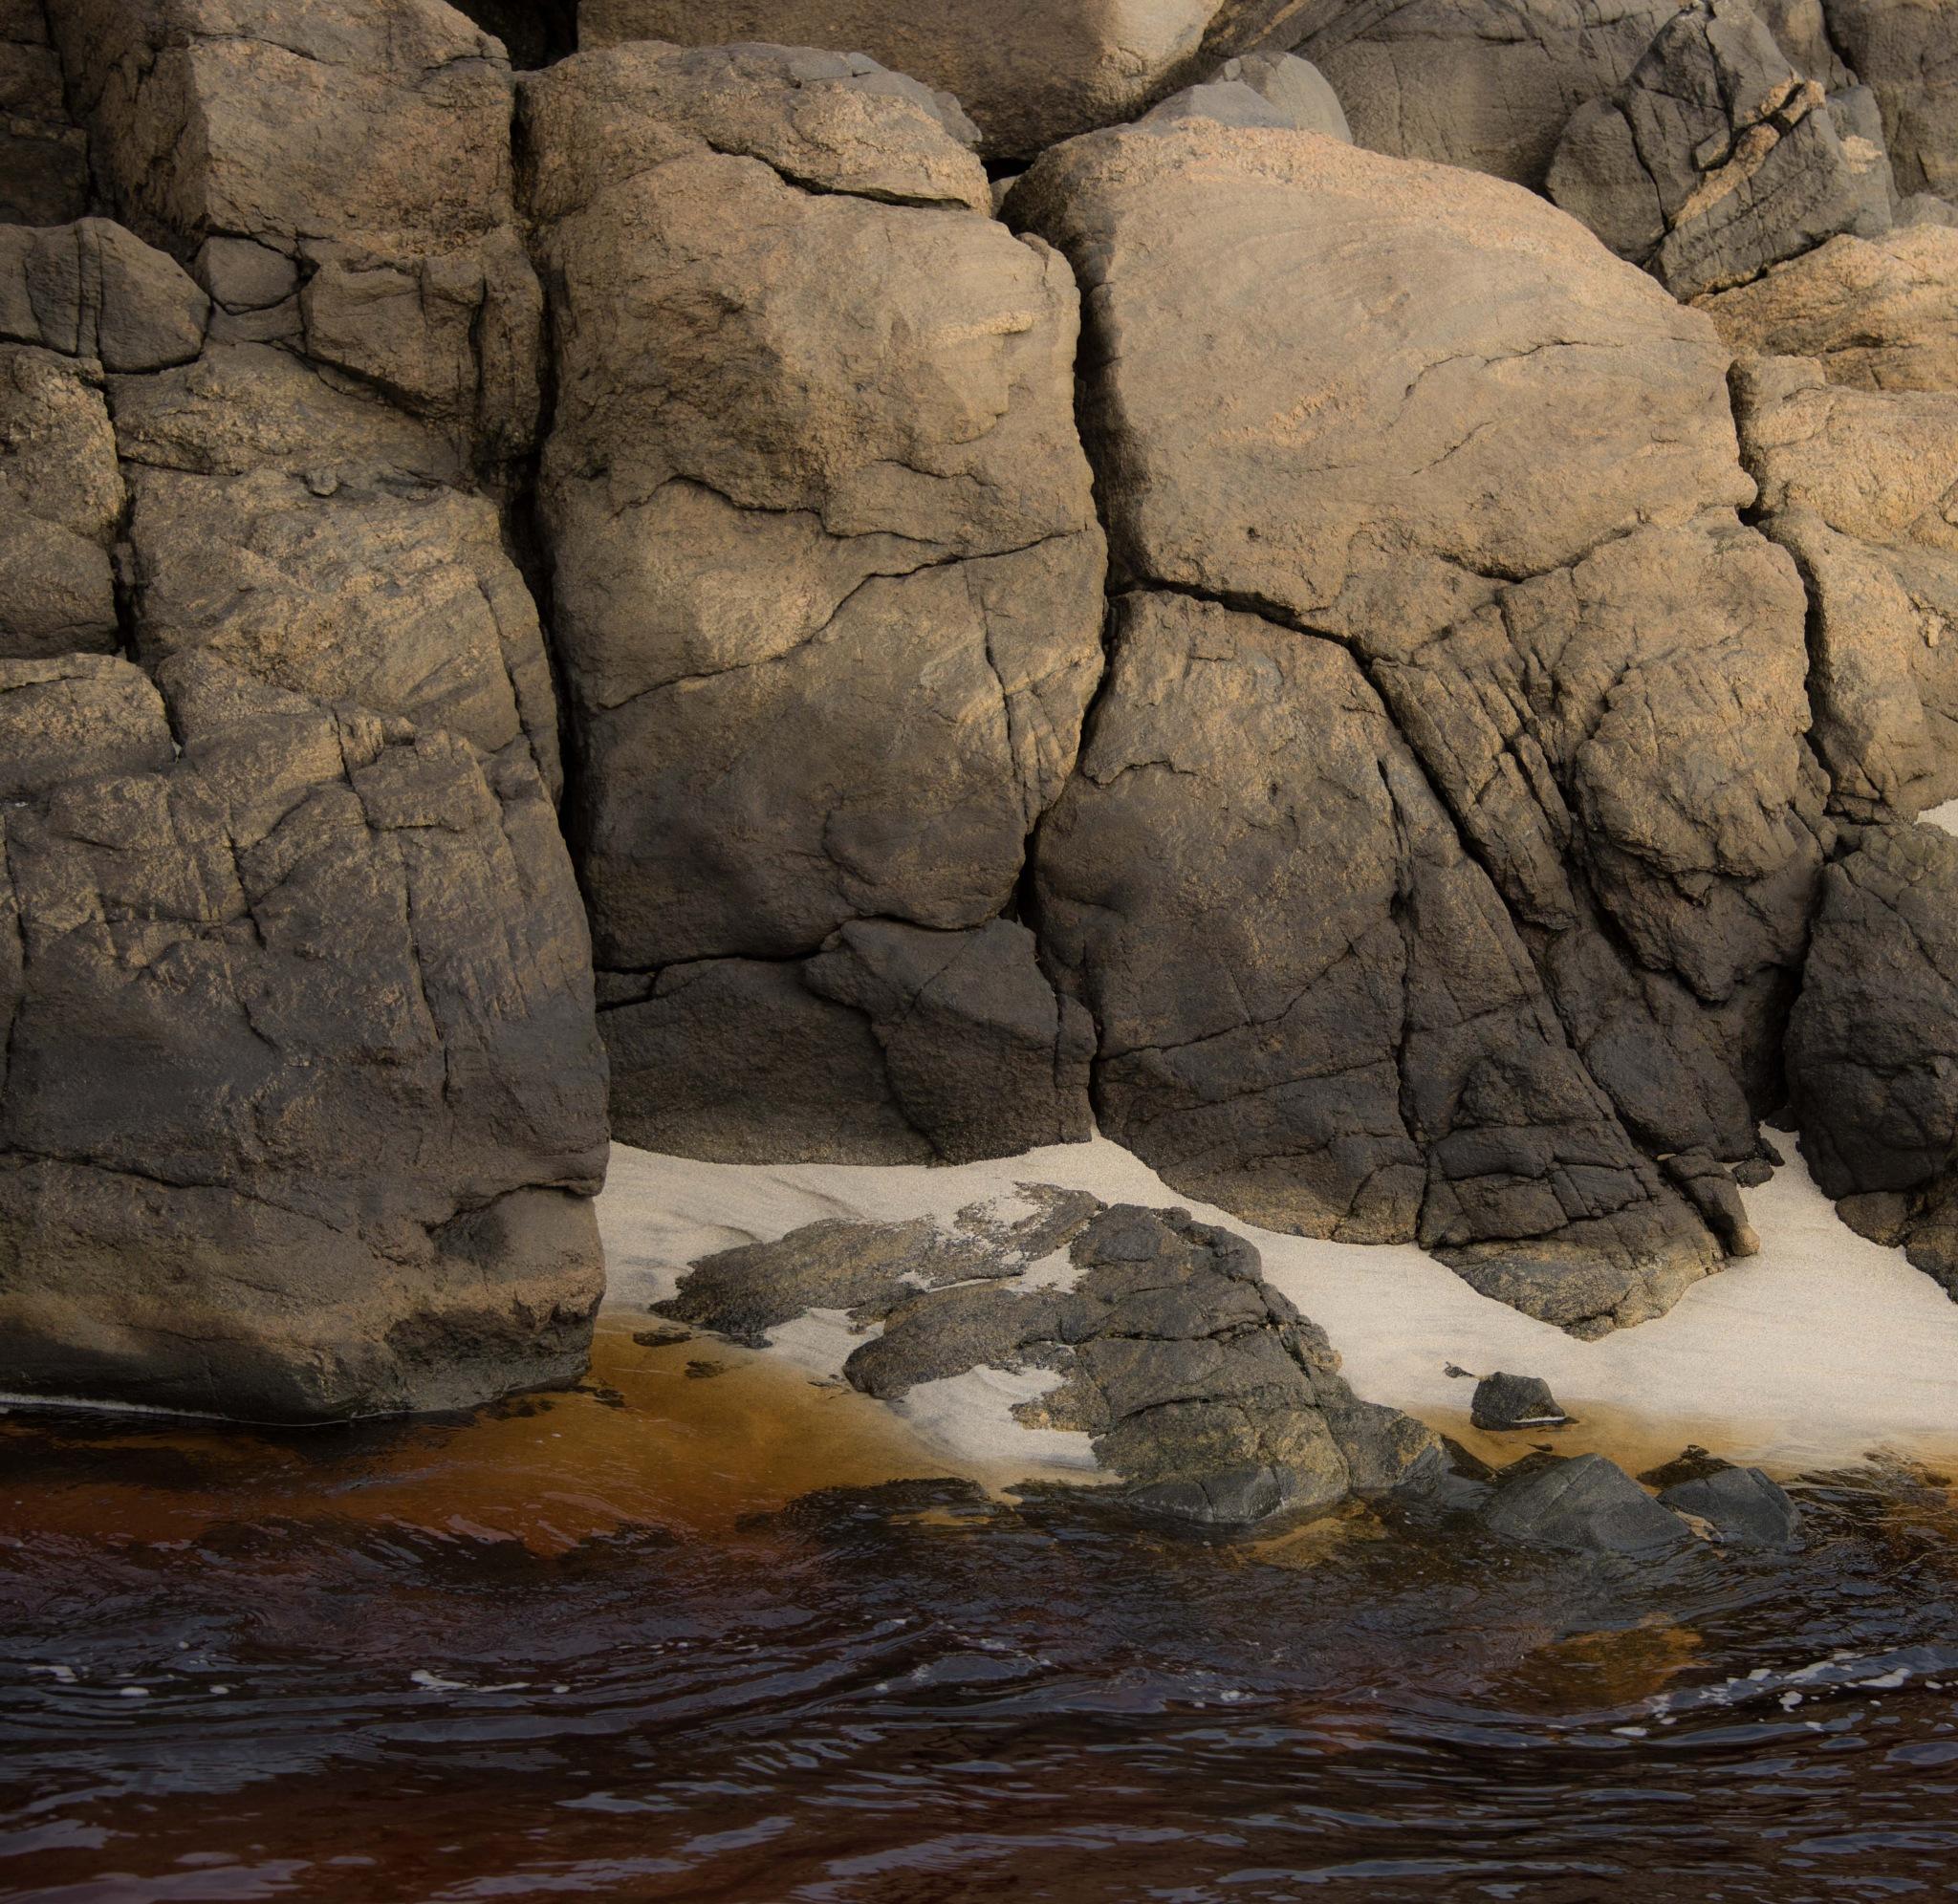 Three grumpy men - rocks and boulders Barra by Paulomac